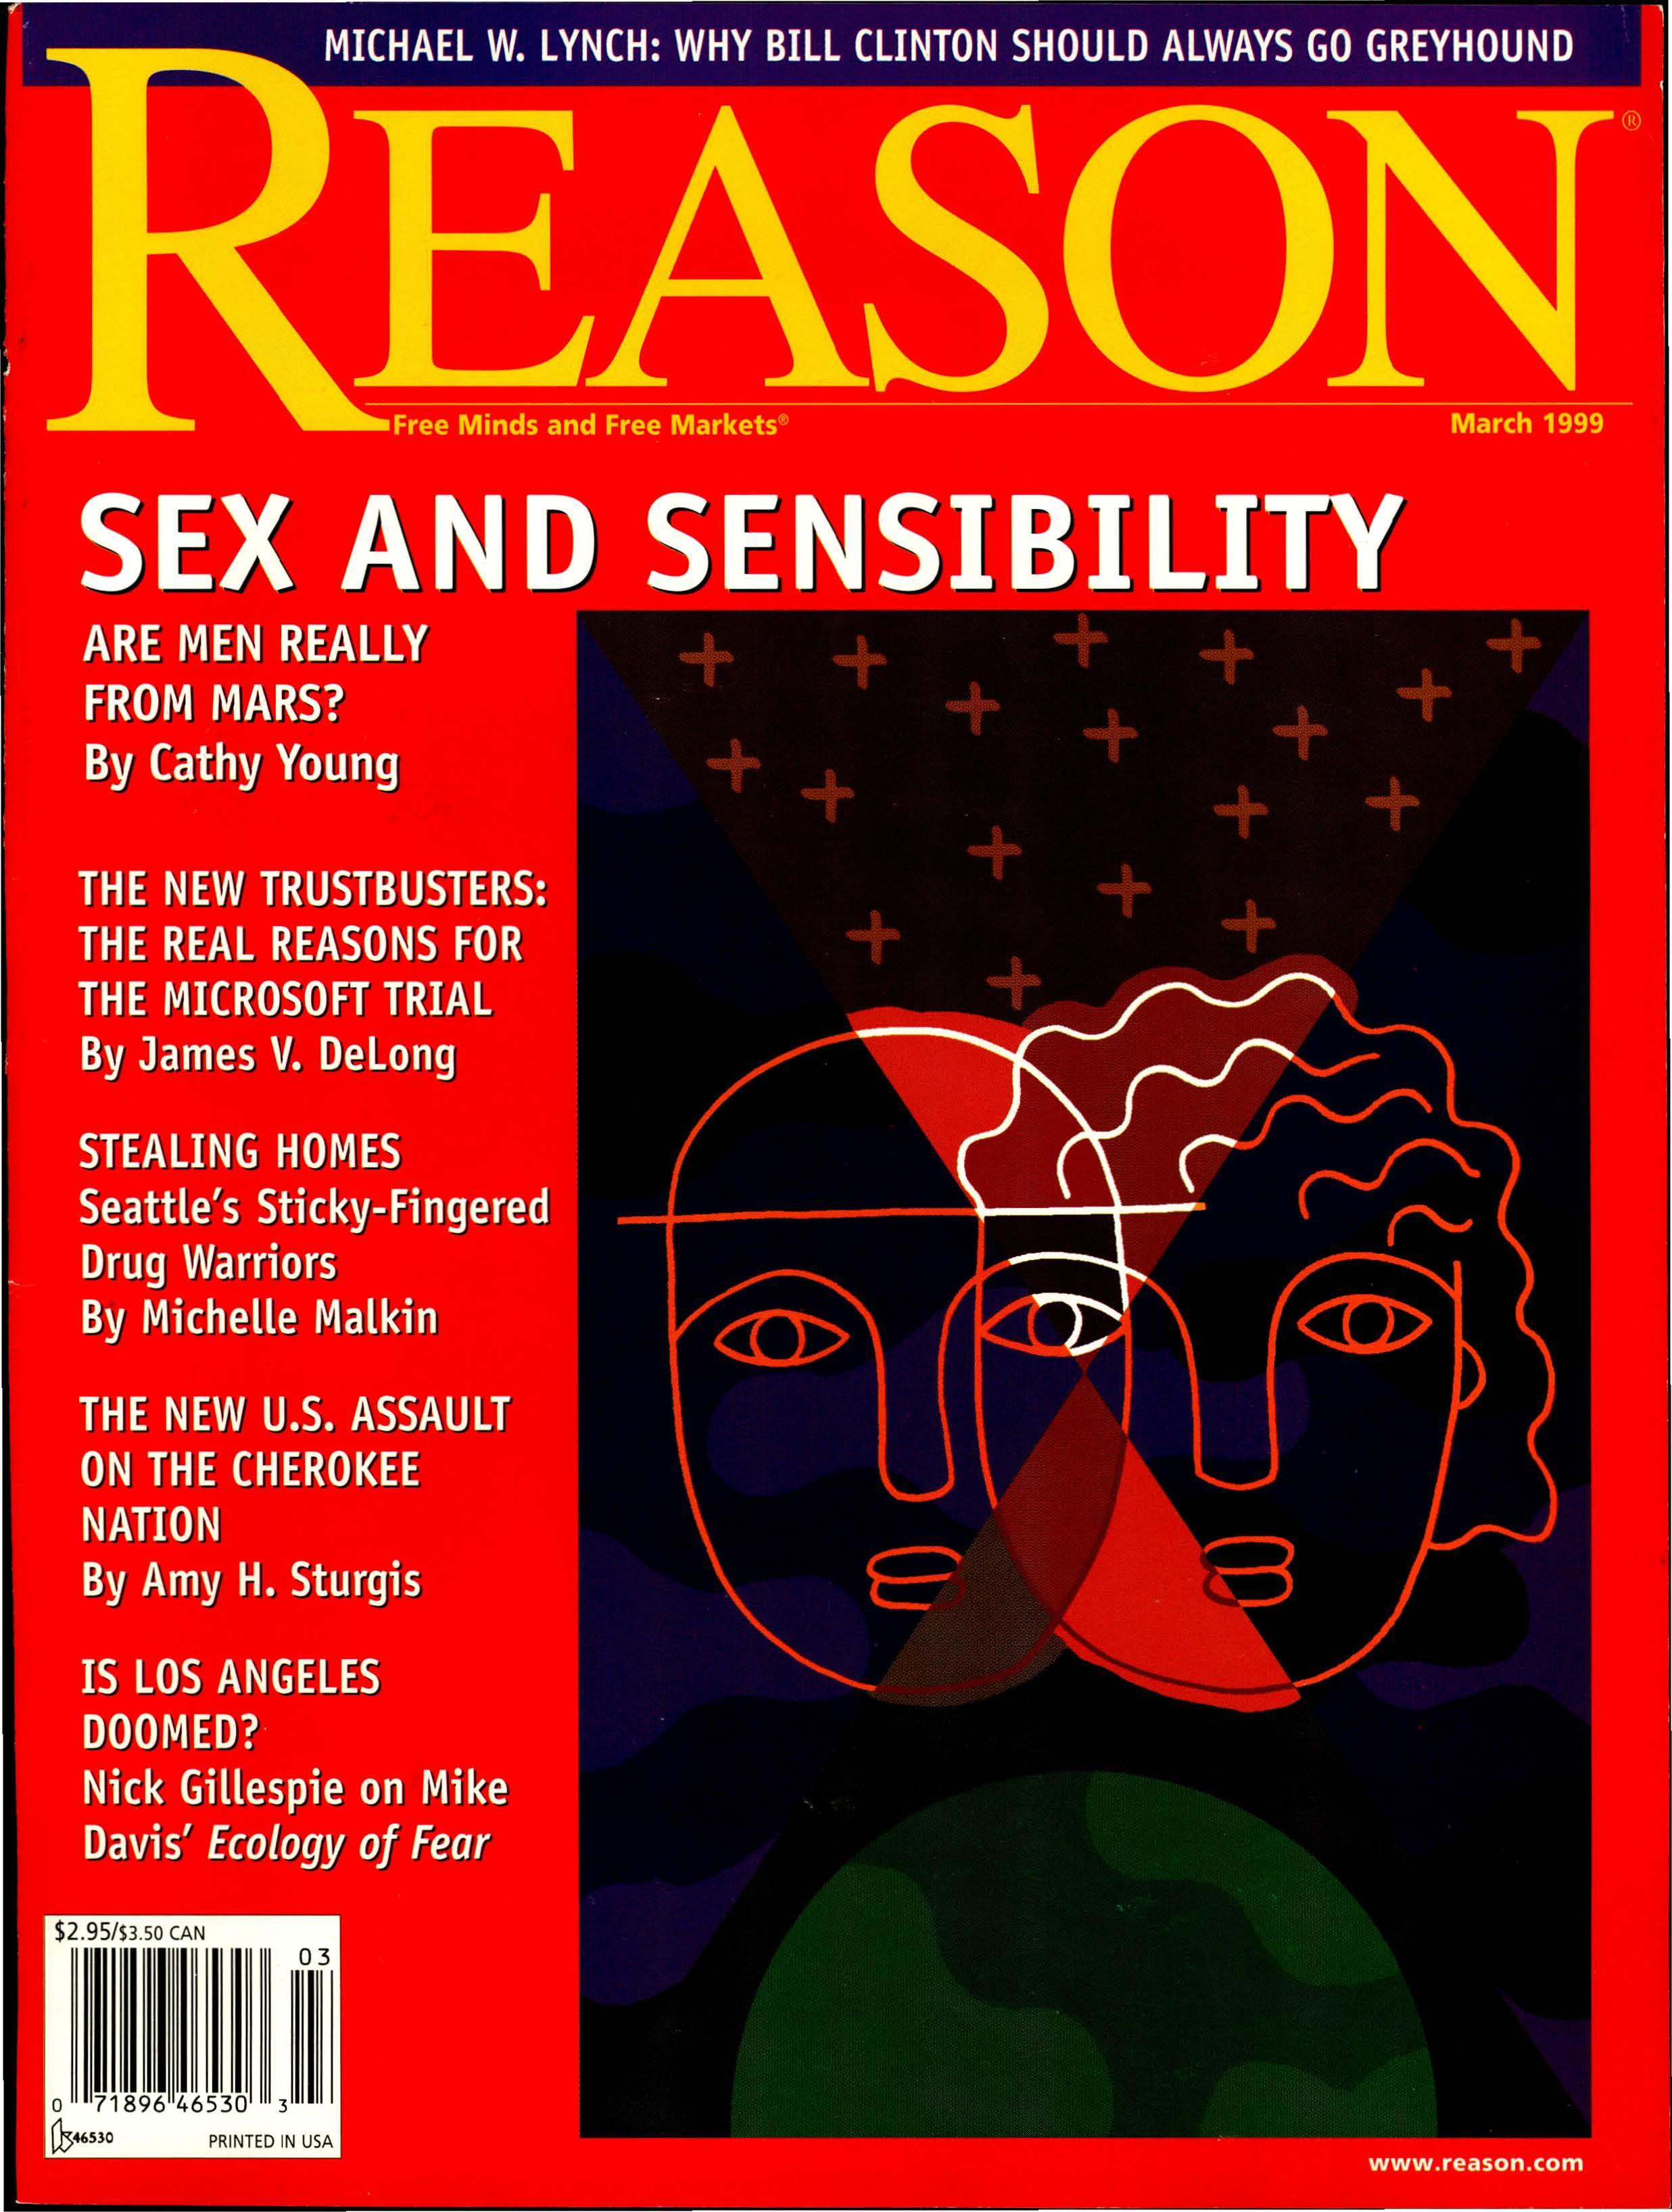 Reason Magazine, March 1999 cover image